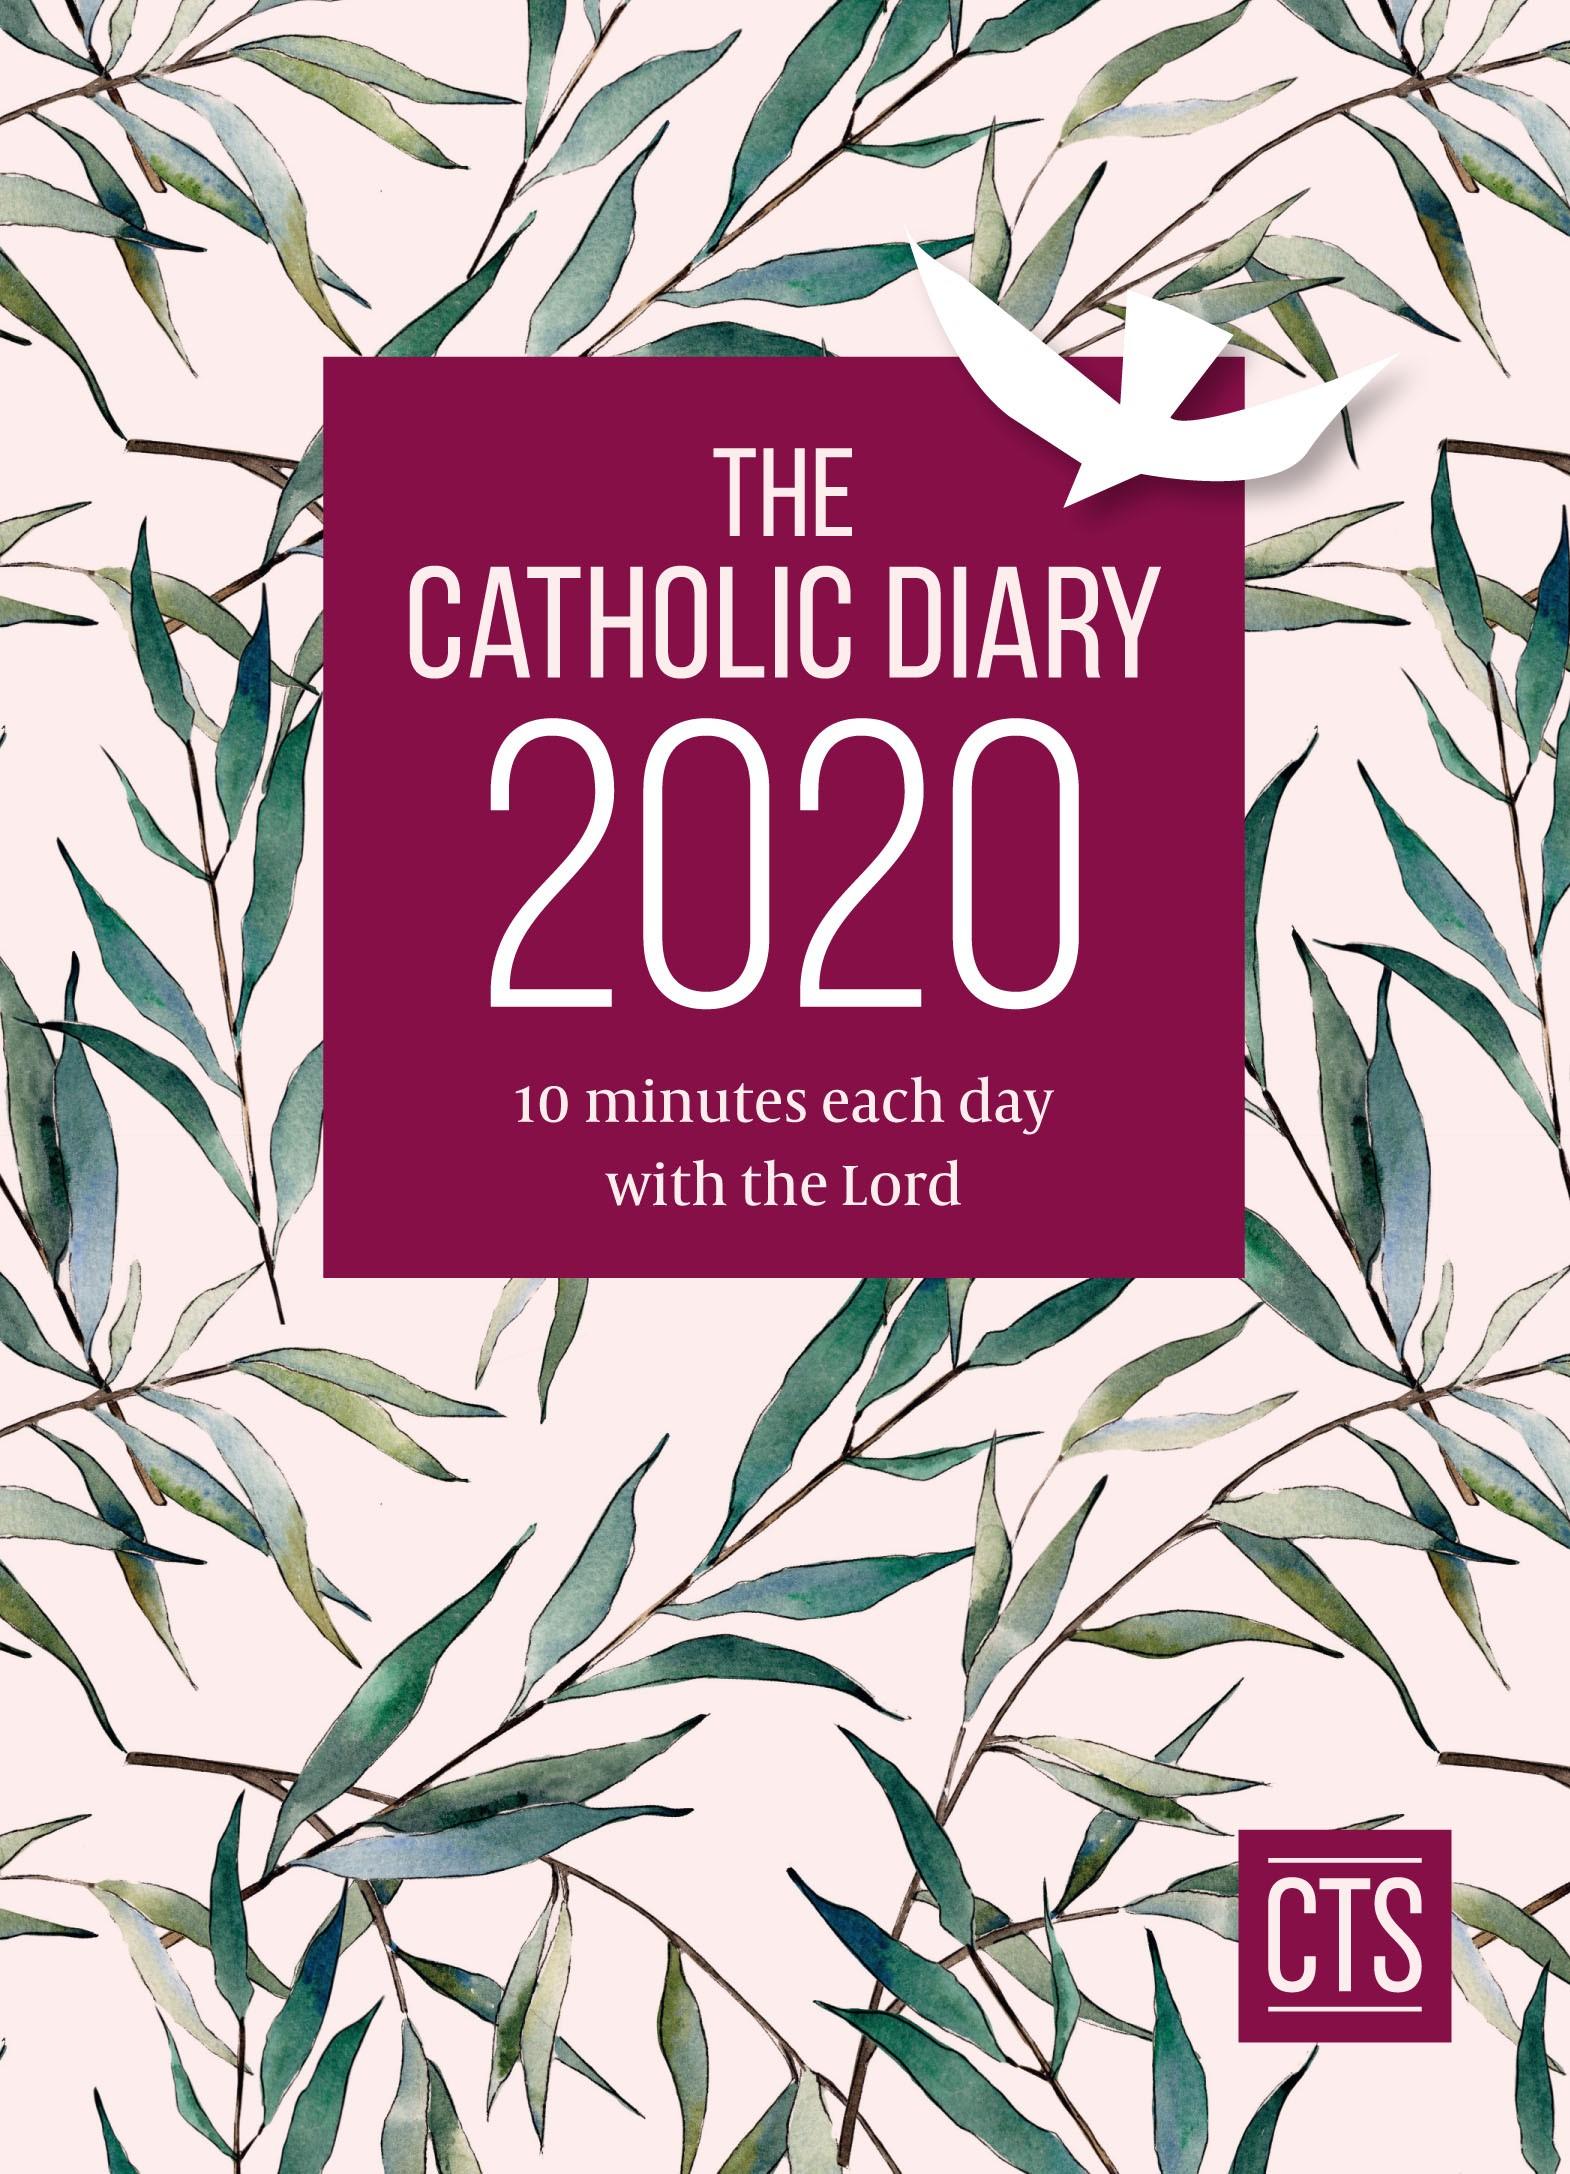 The Catholic Diary 2020